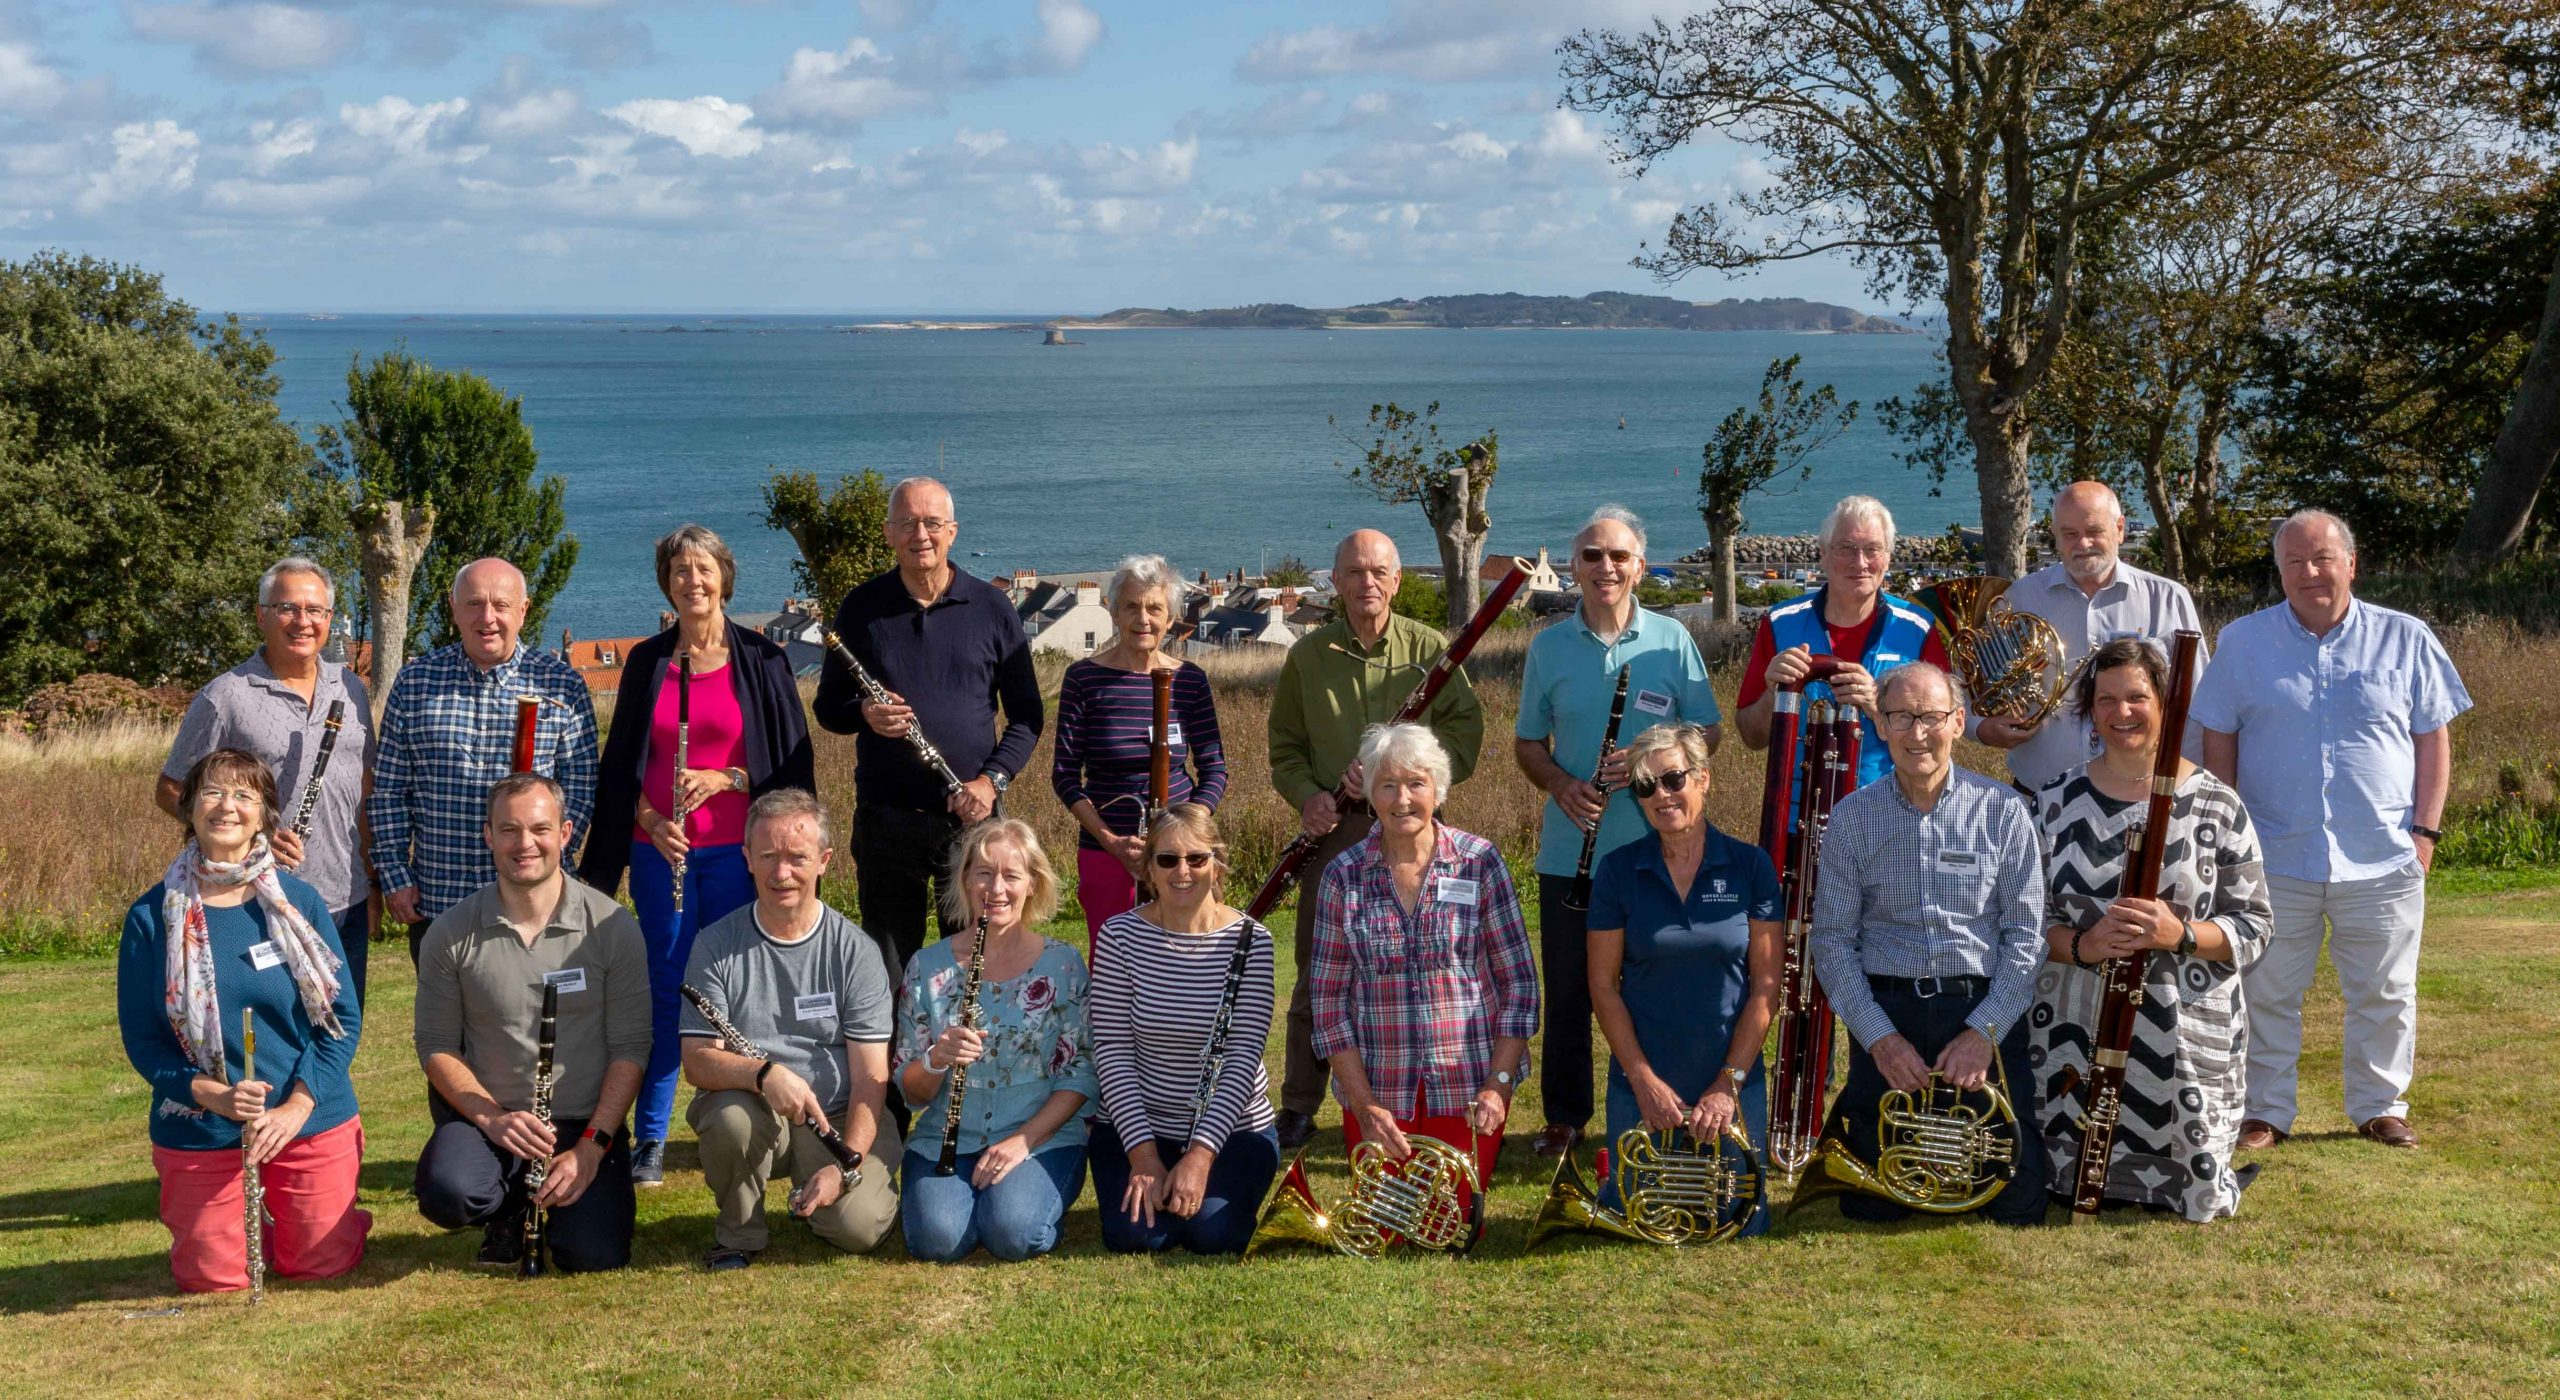 Wind Serenades in Guernsey, September 2021. [Photo: Chris Jeffery]